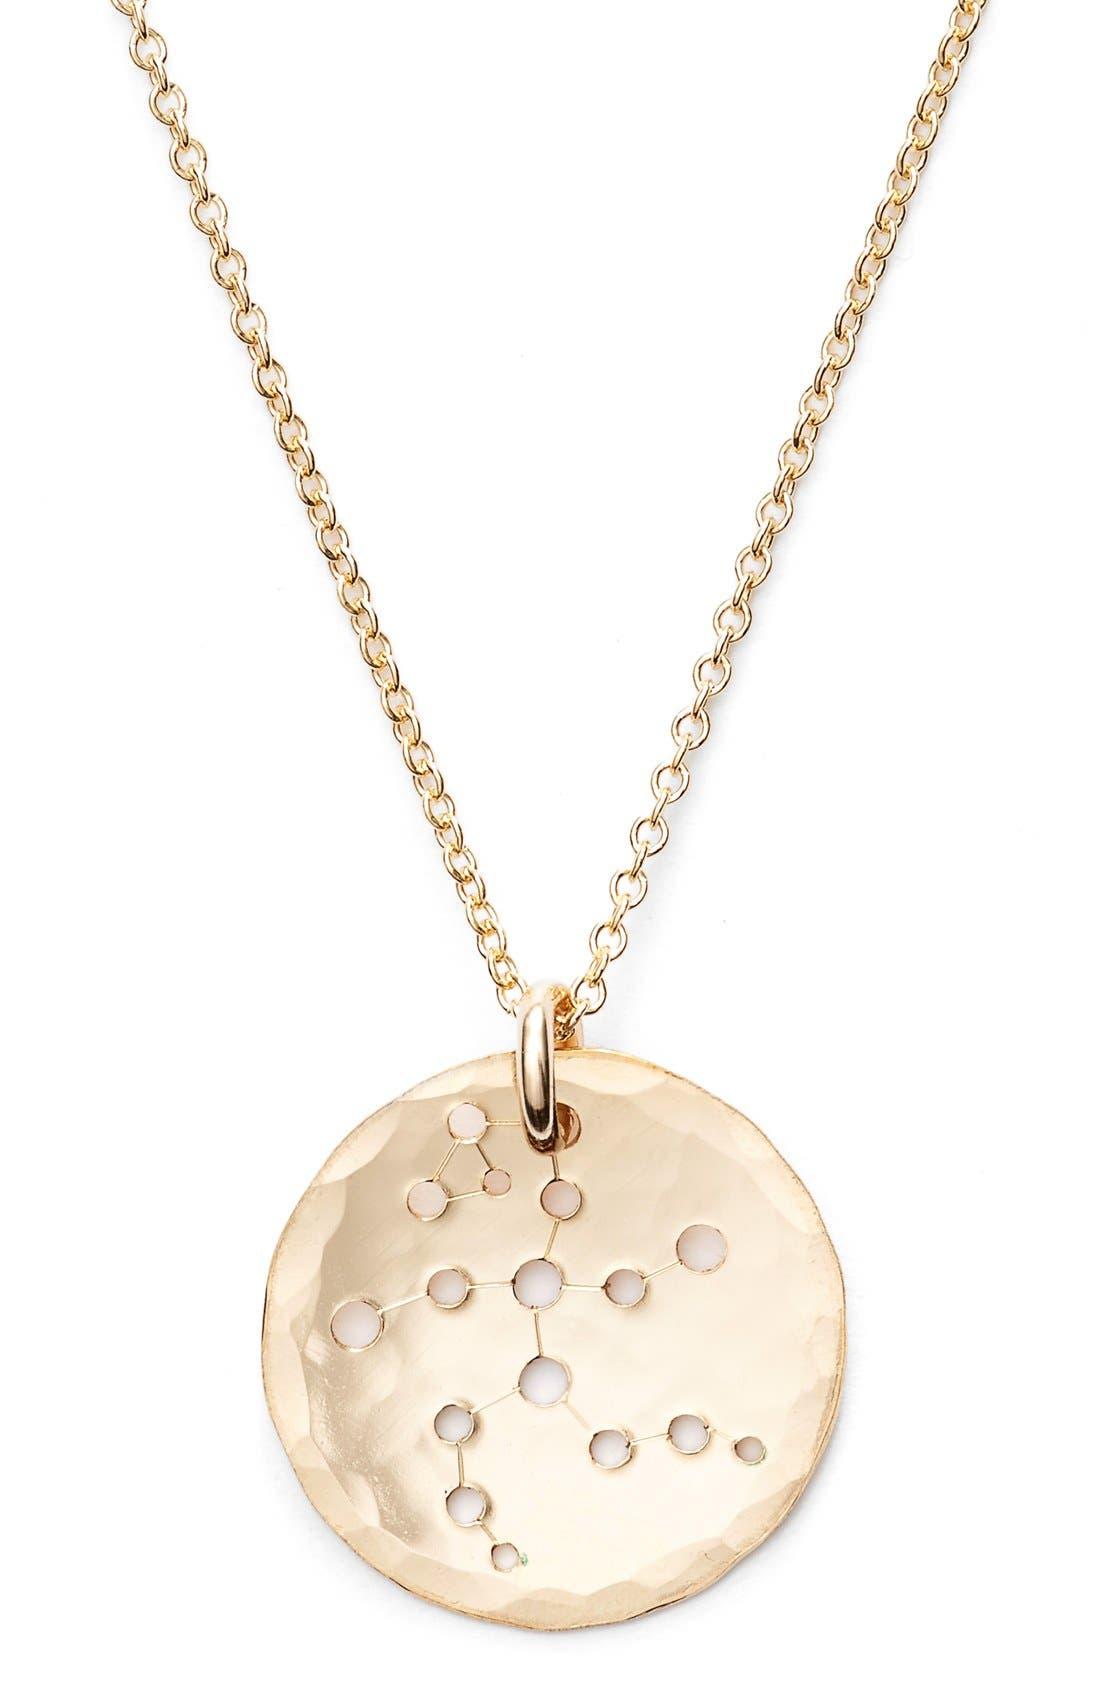 Ija 'Small Zodiac' 14k-Gold Fill Necklace,                             Alternate thumbnail 30, color,